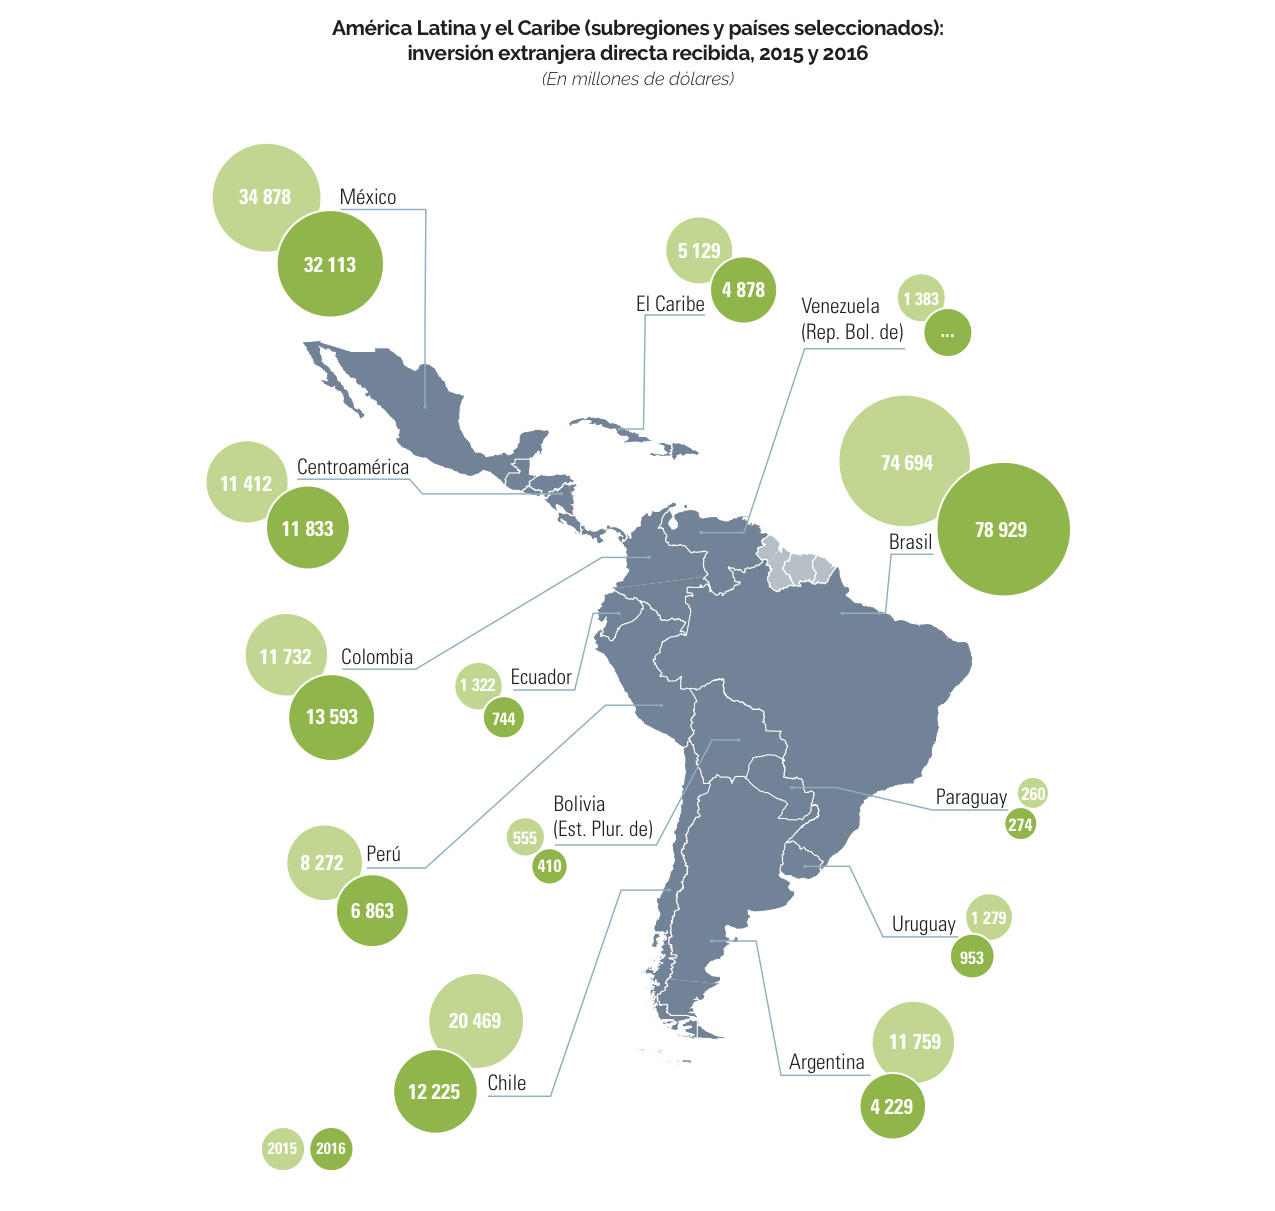 Inversión extranjera en América Latina caerá 5% en 2017: Cepal